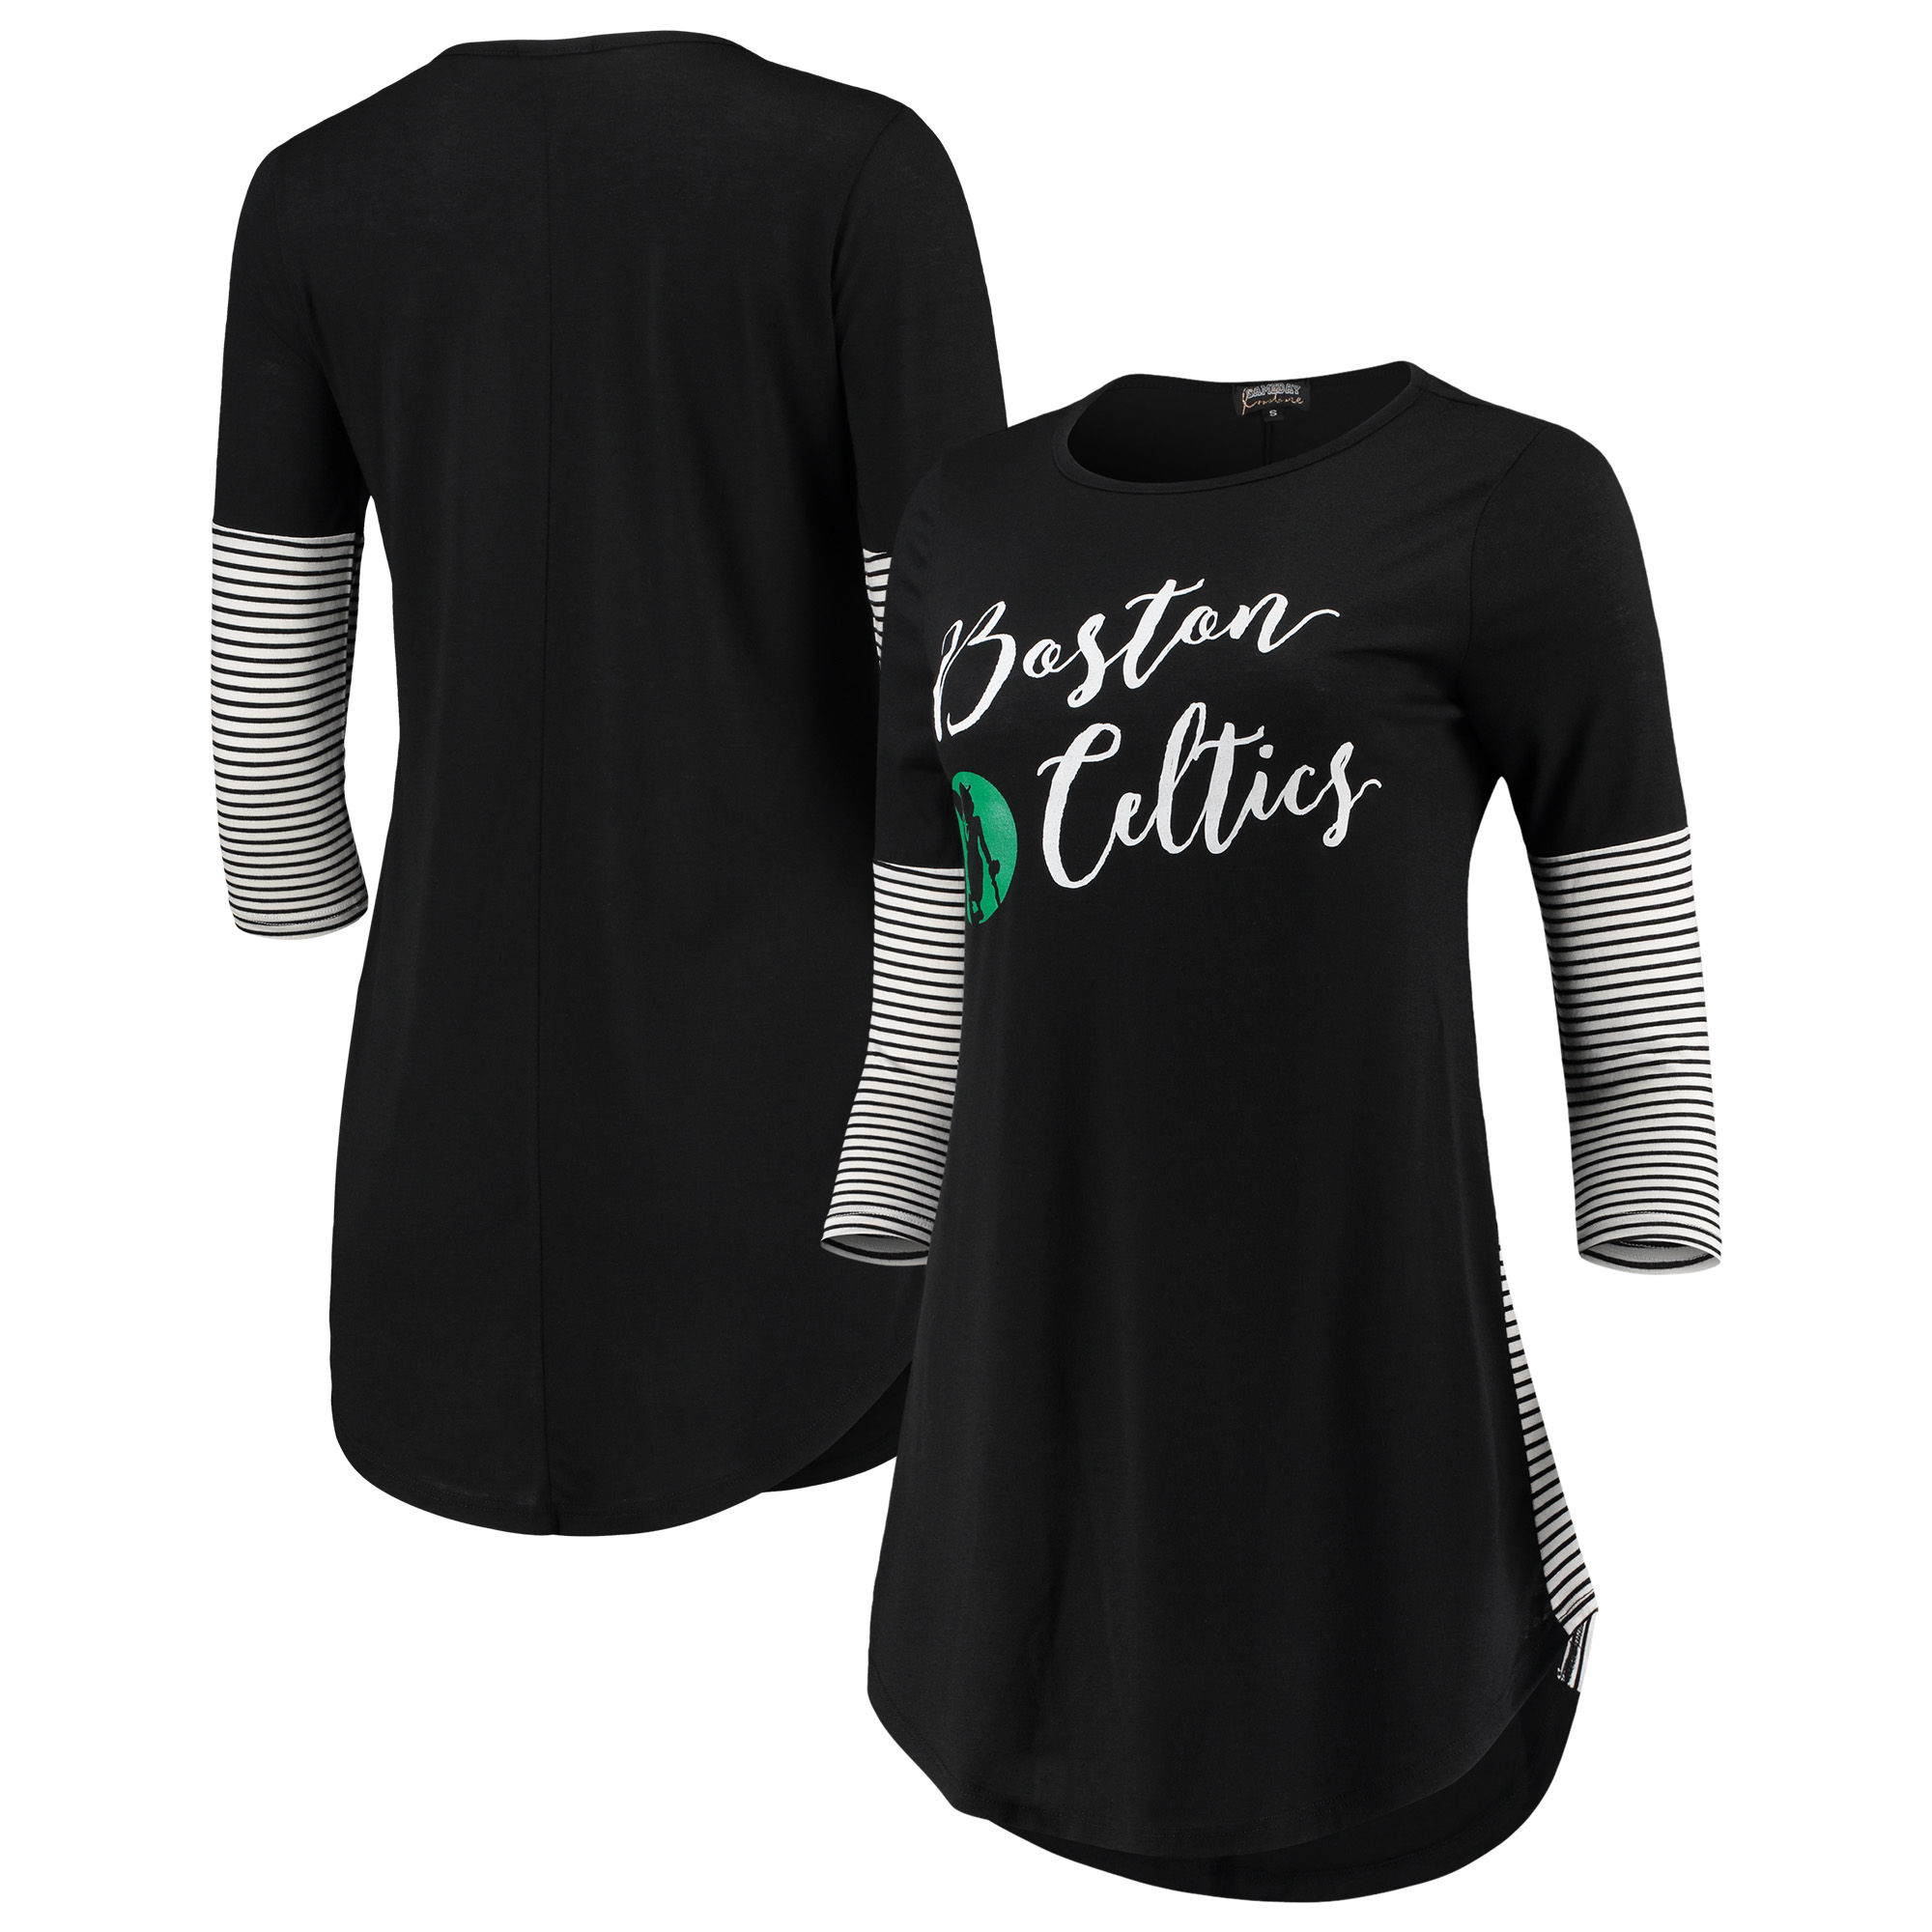 Boston Celtics Women's Striking in Stripes 3/4 Sleeve Tunic T-Shirt - Black